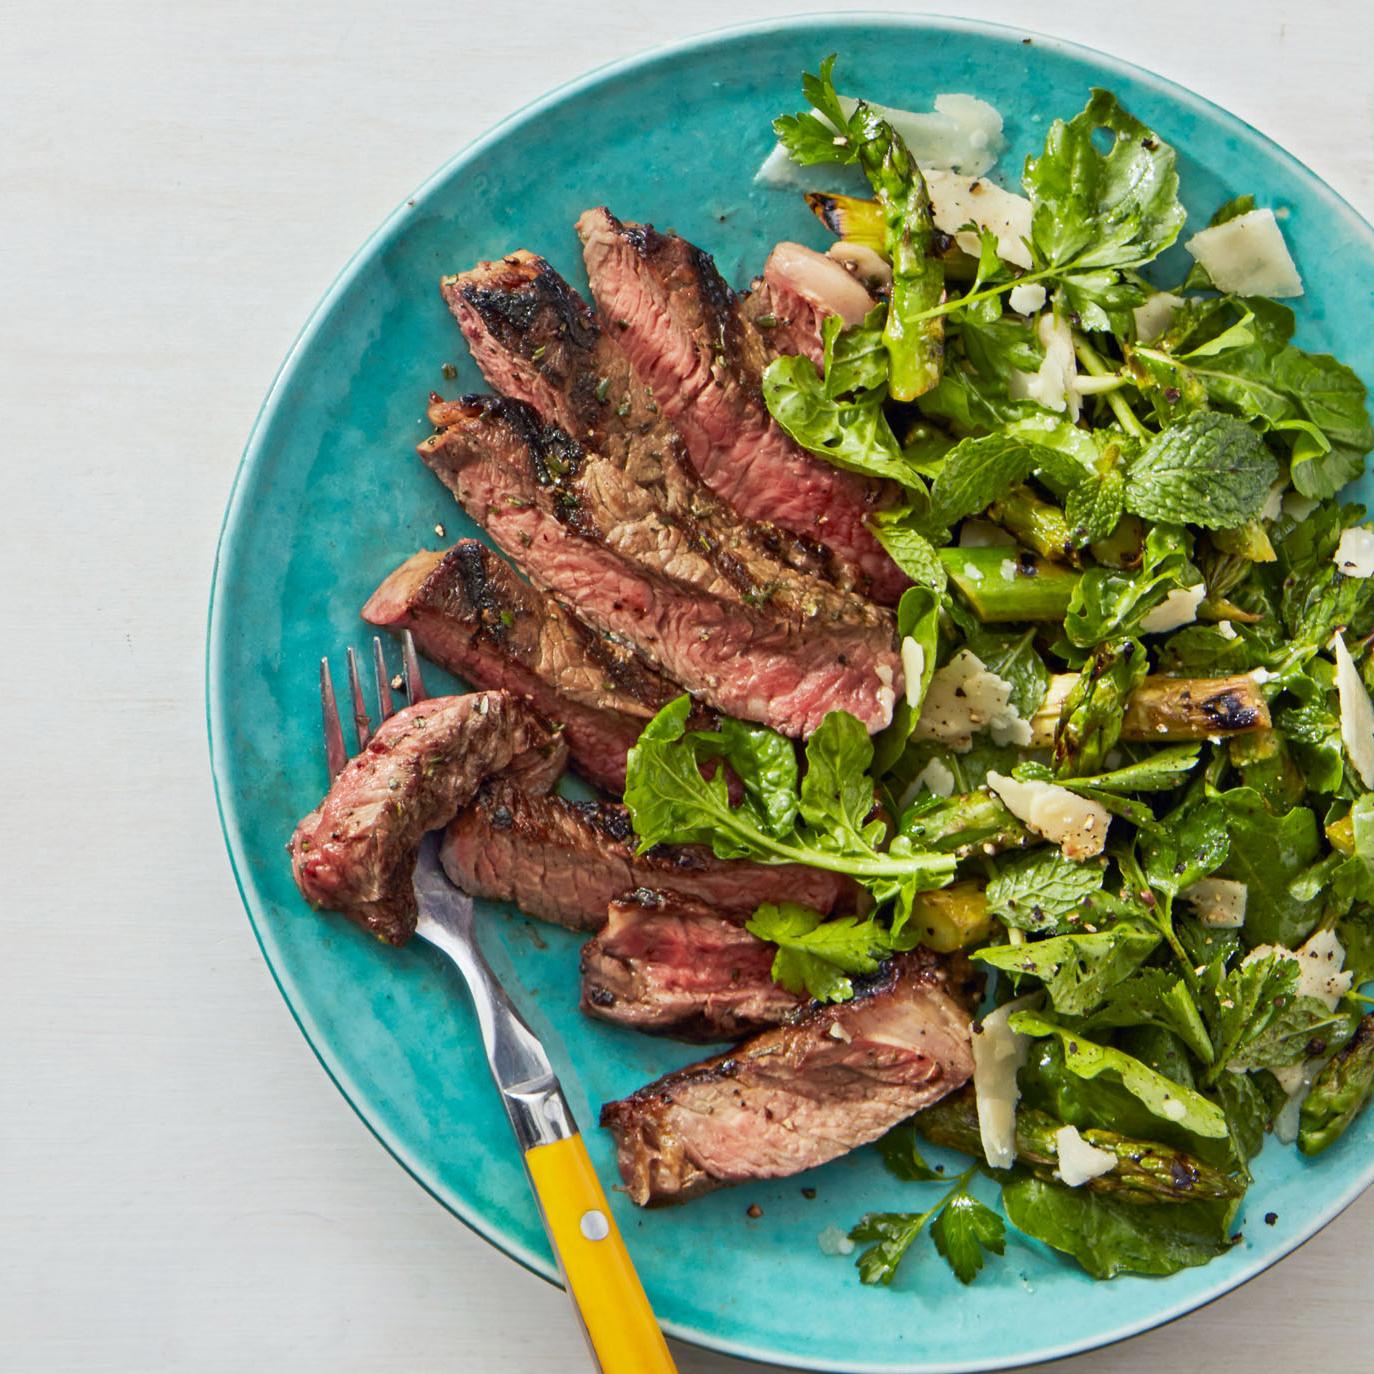 tagliata with grilled asparagus